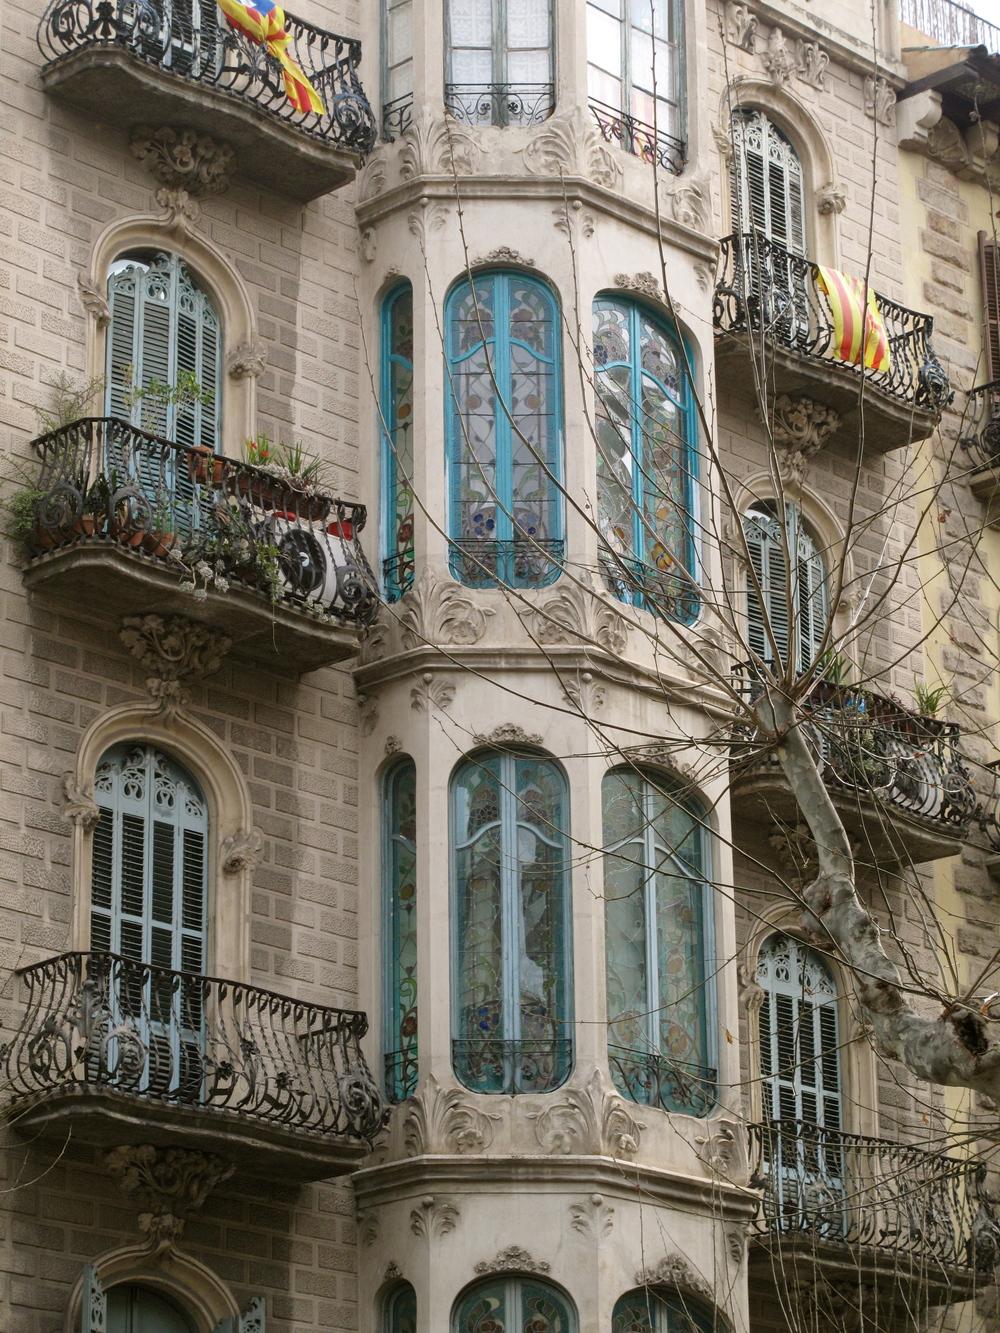 Windows of buildings in Barcelona